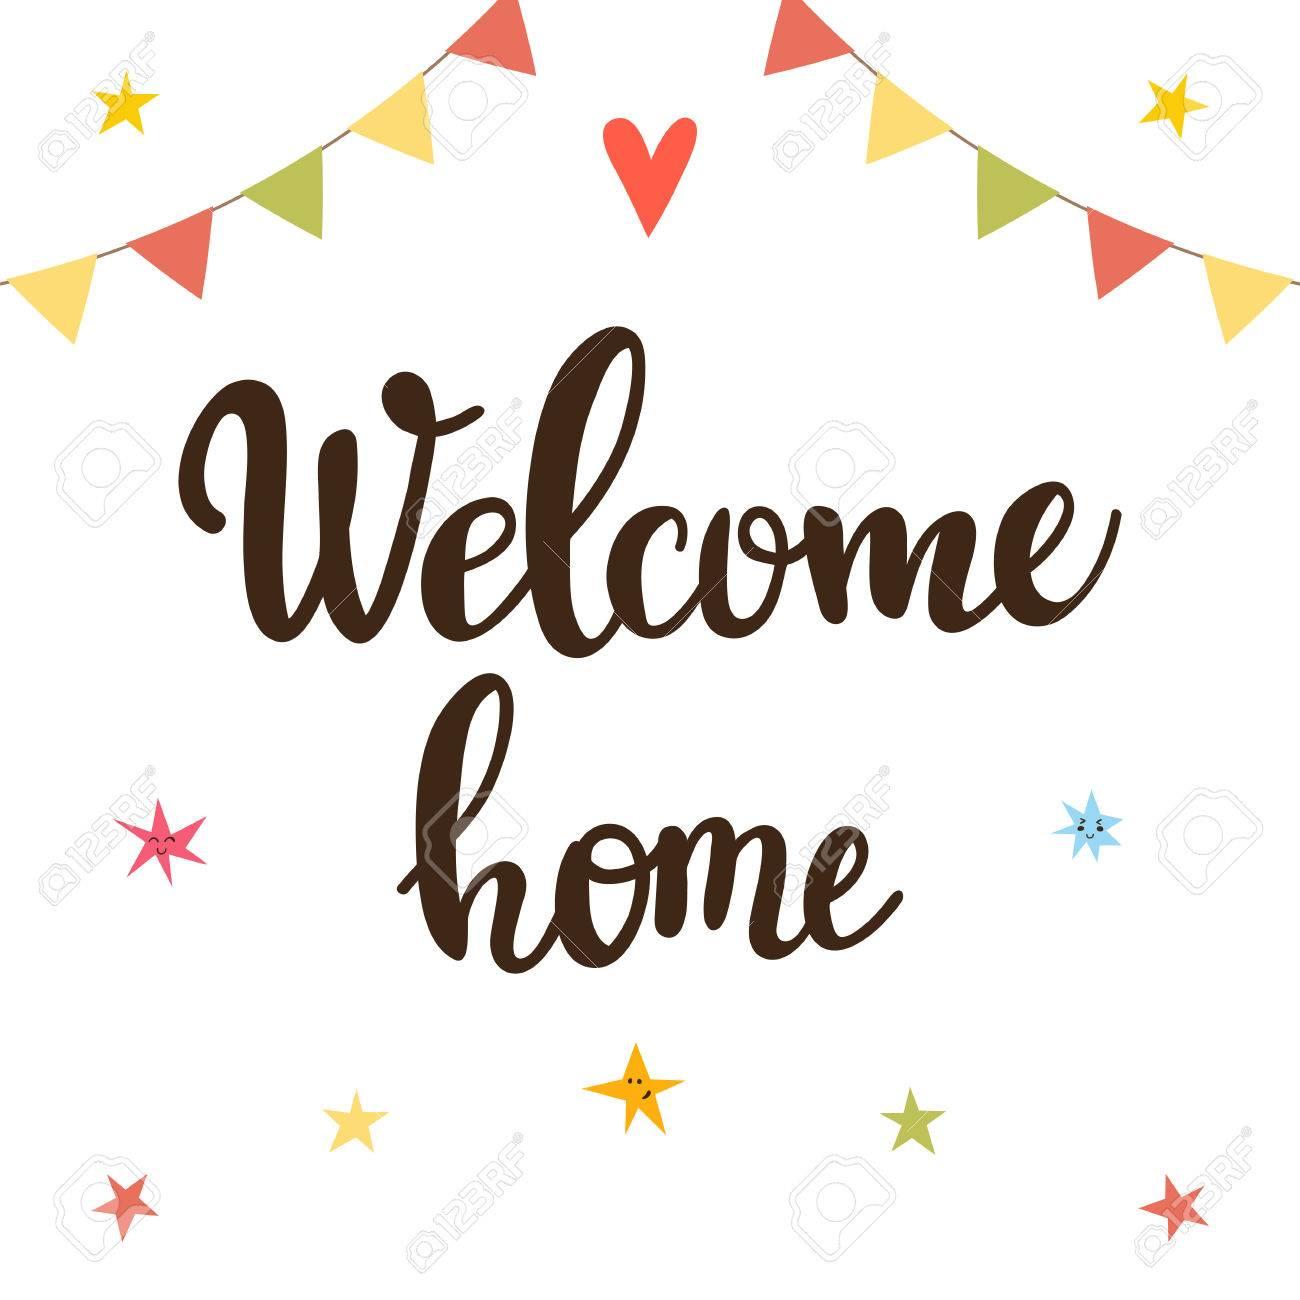 welcome home poster - Isken kaptanband co